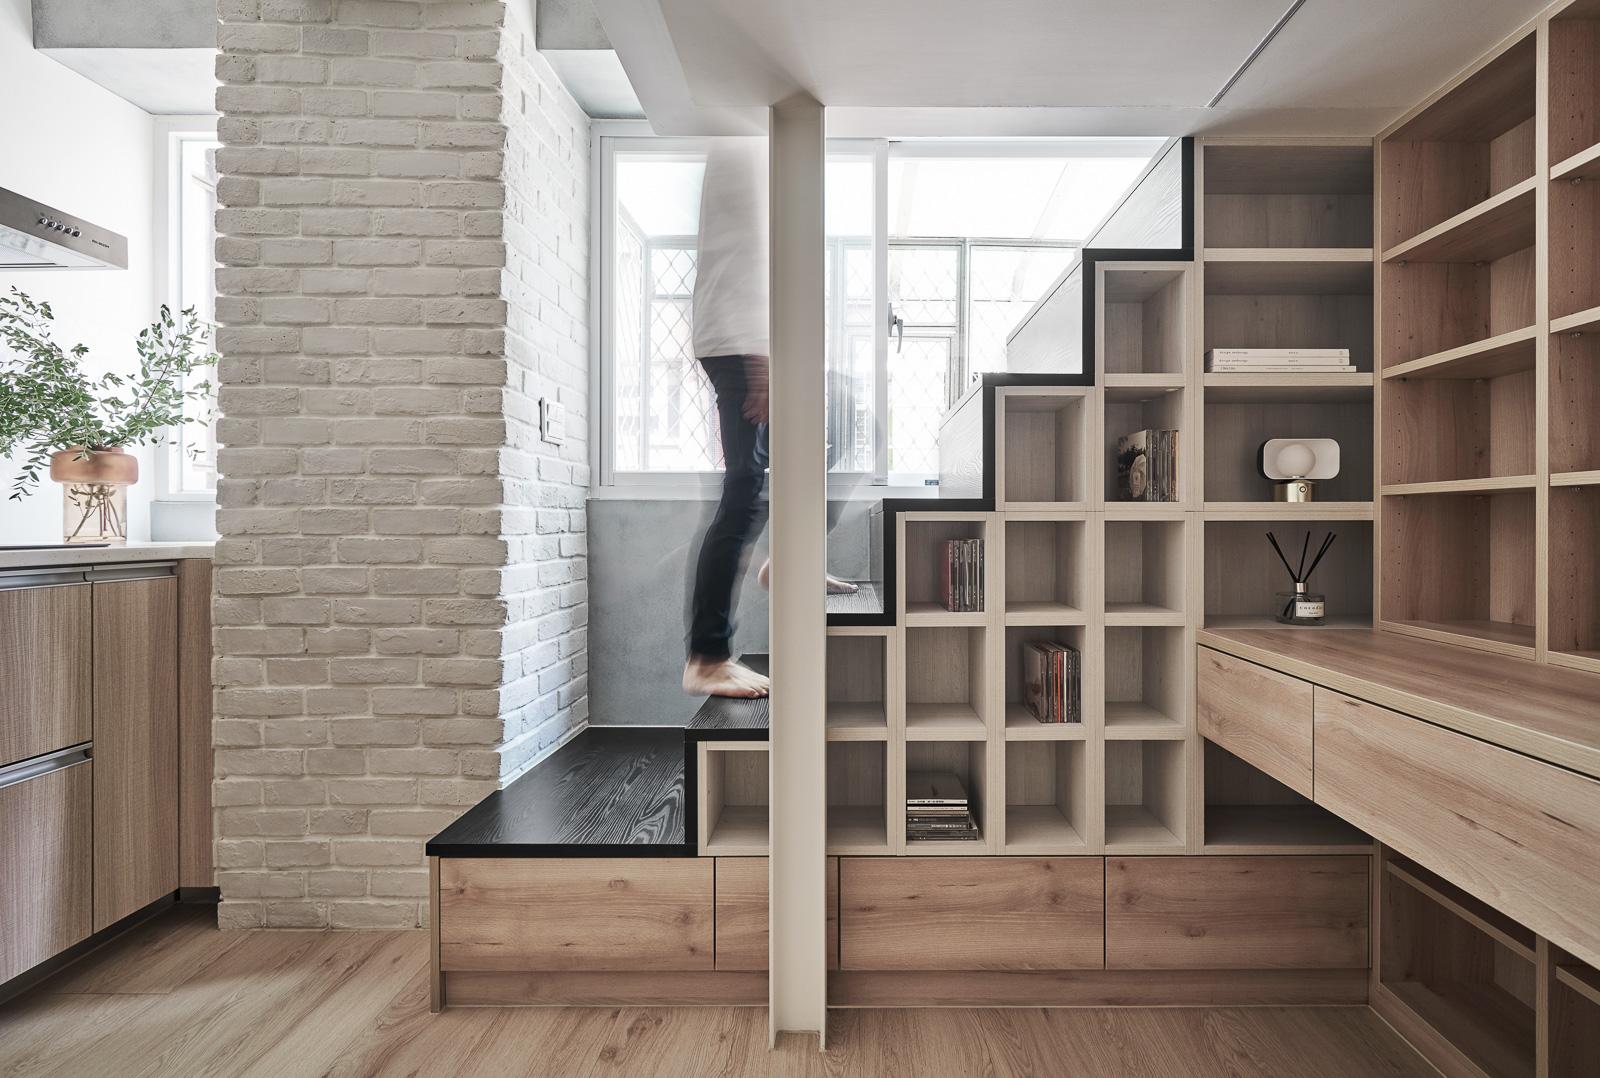 NestSpace_SmallHouse_S-196